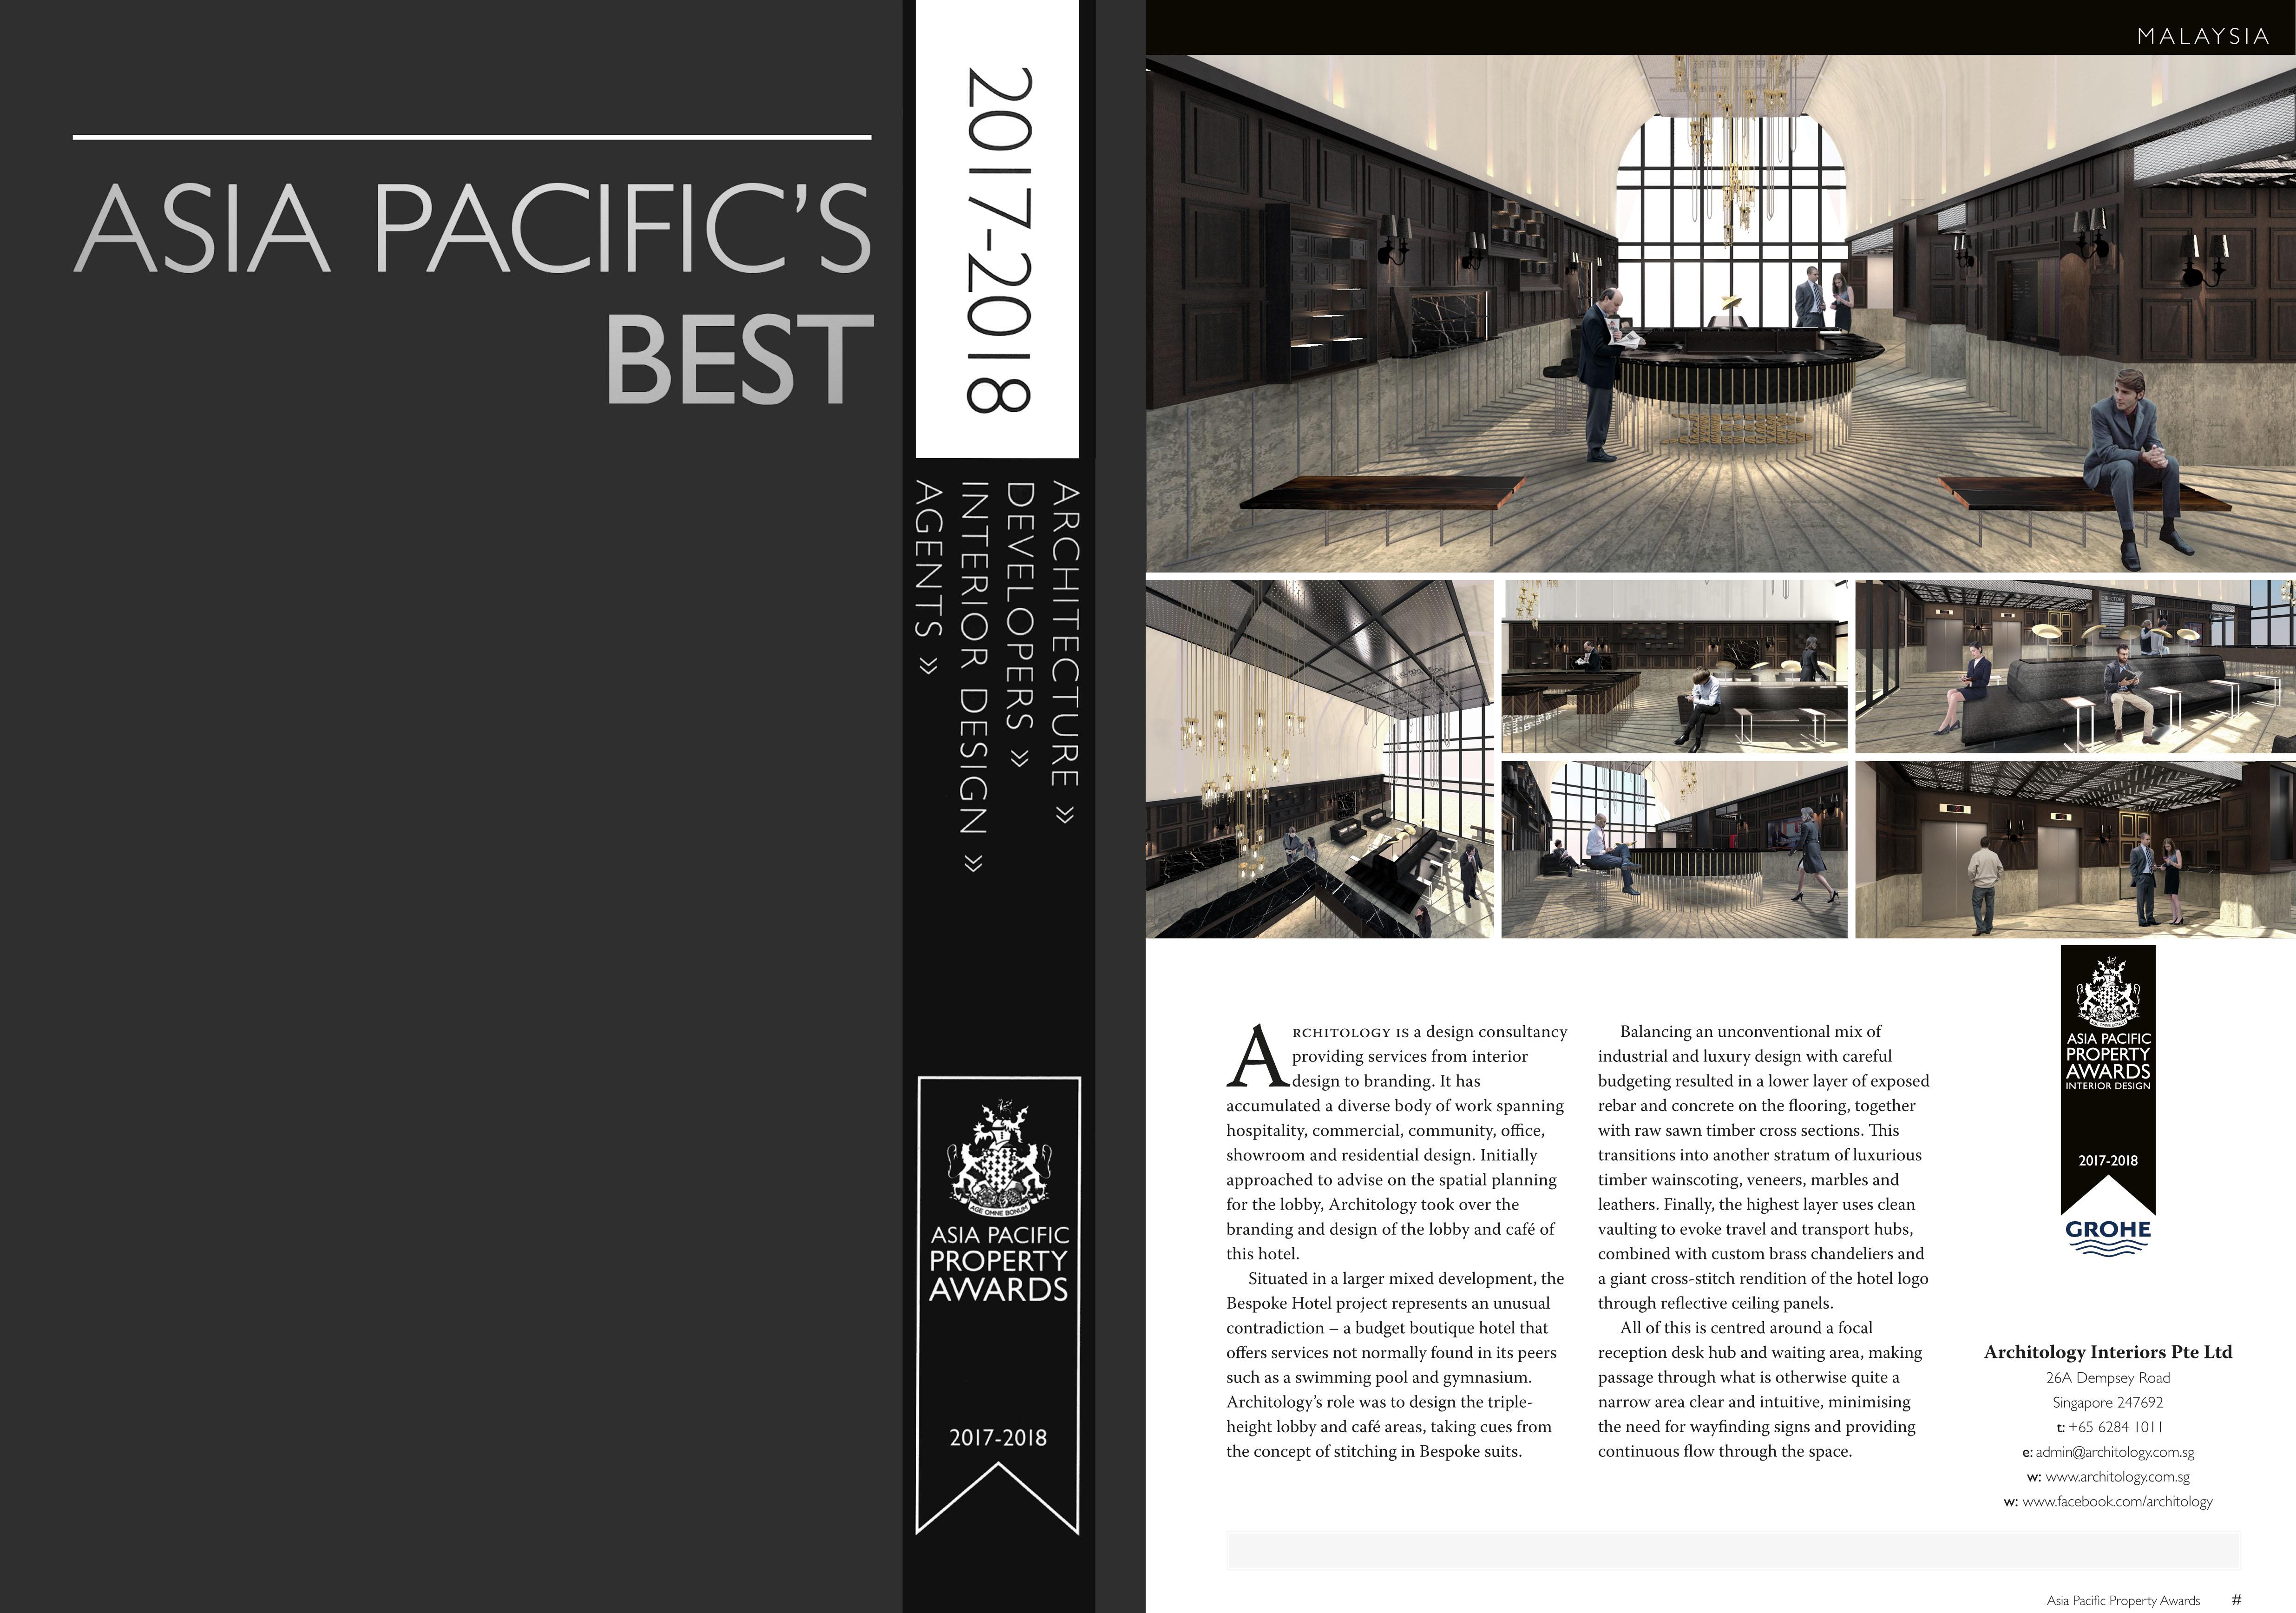 Bespoke Interior Design | Architology Interiors | Singapore